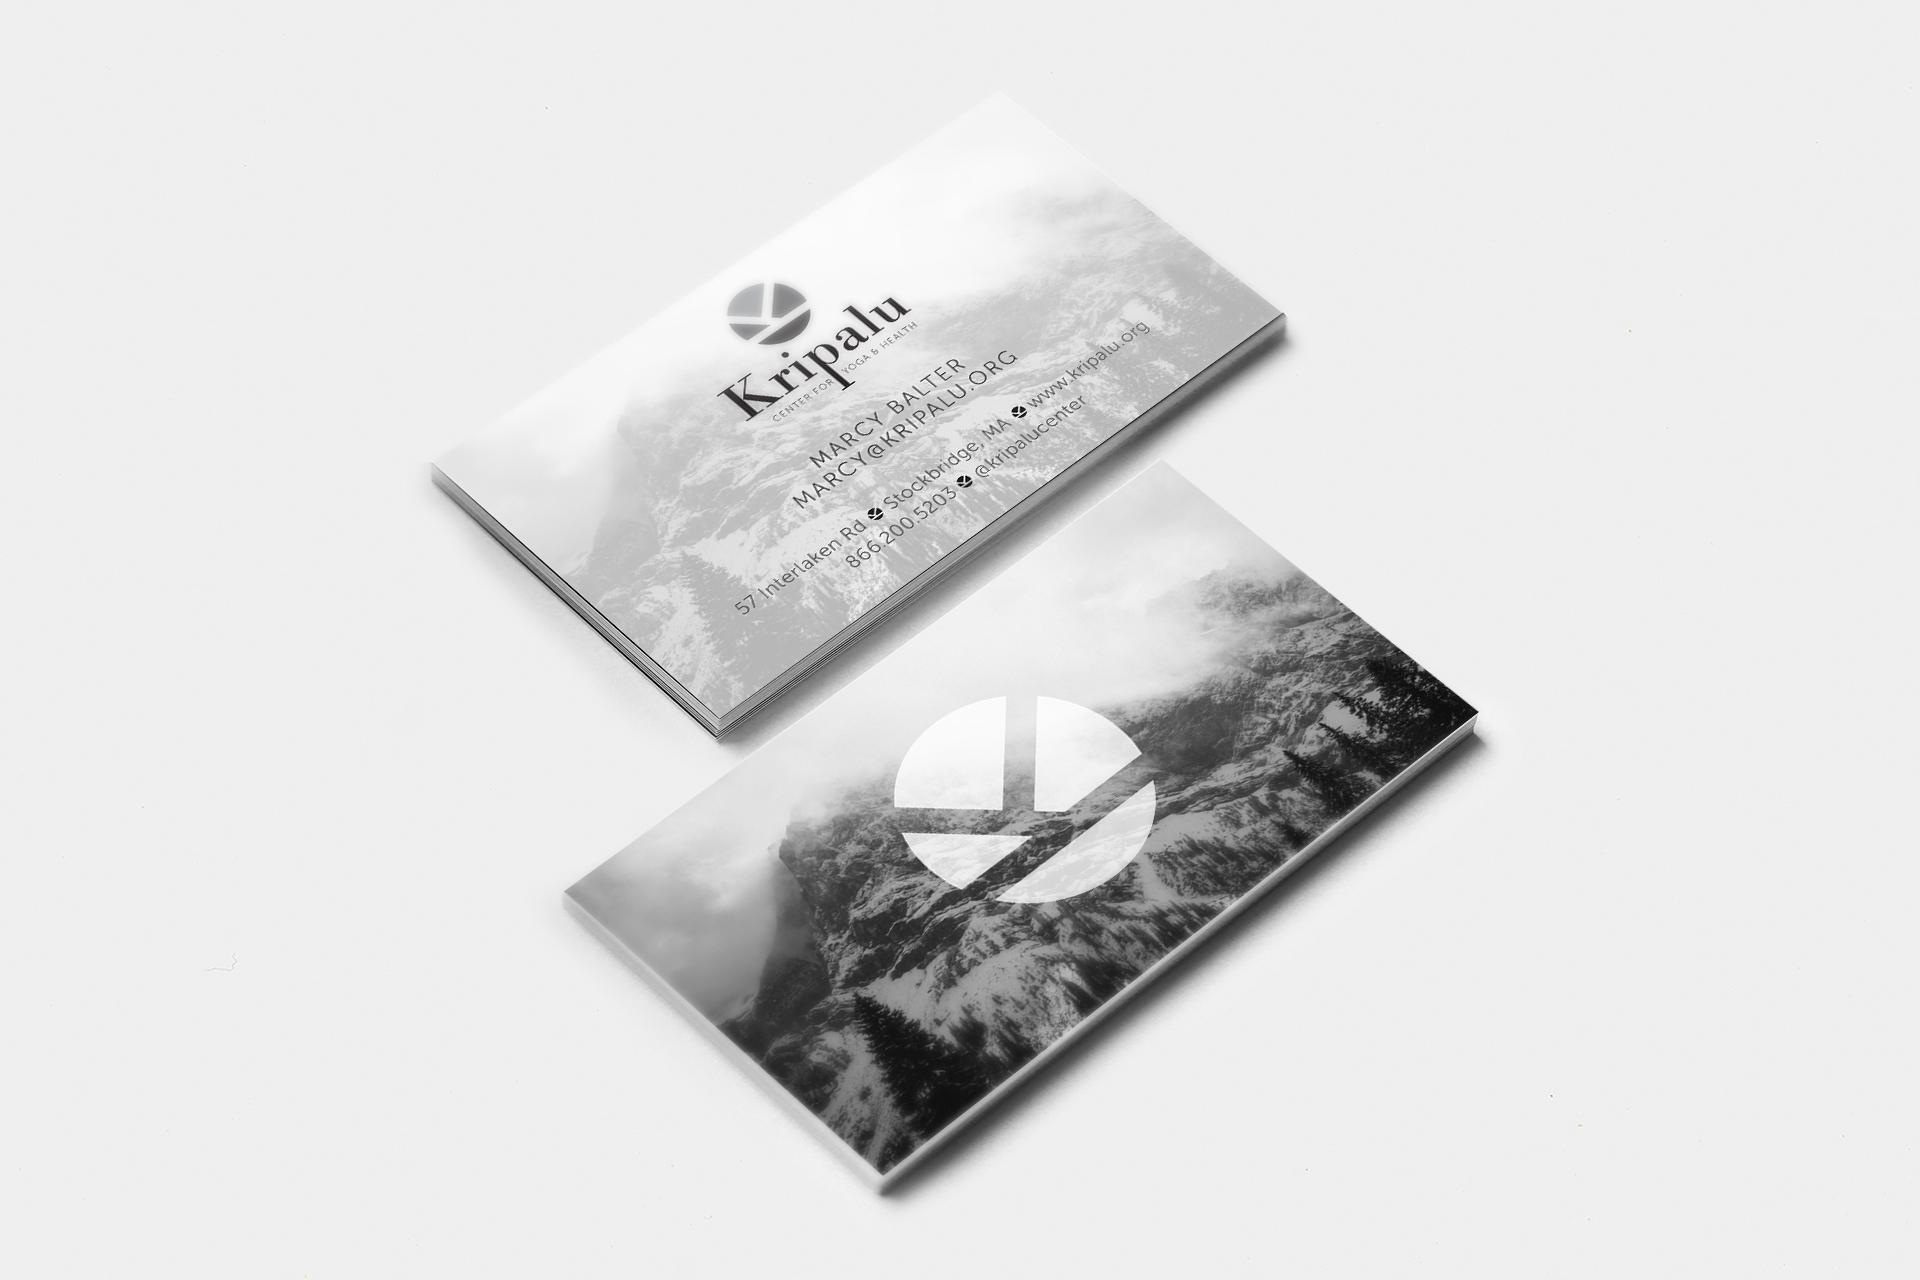 kripalu business card mockup 2.jpg